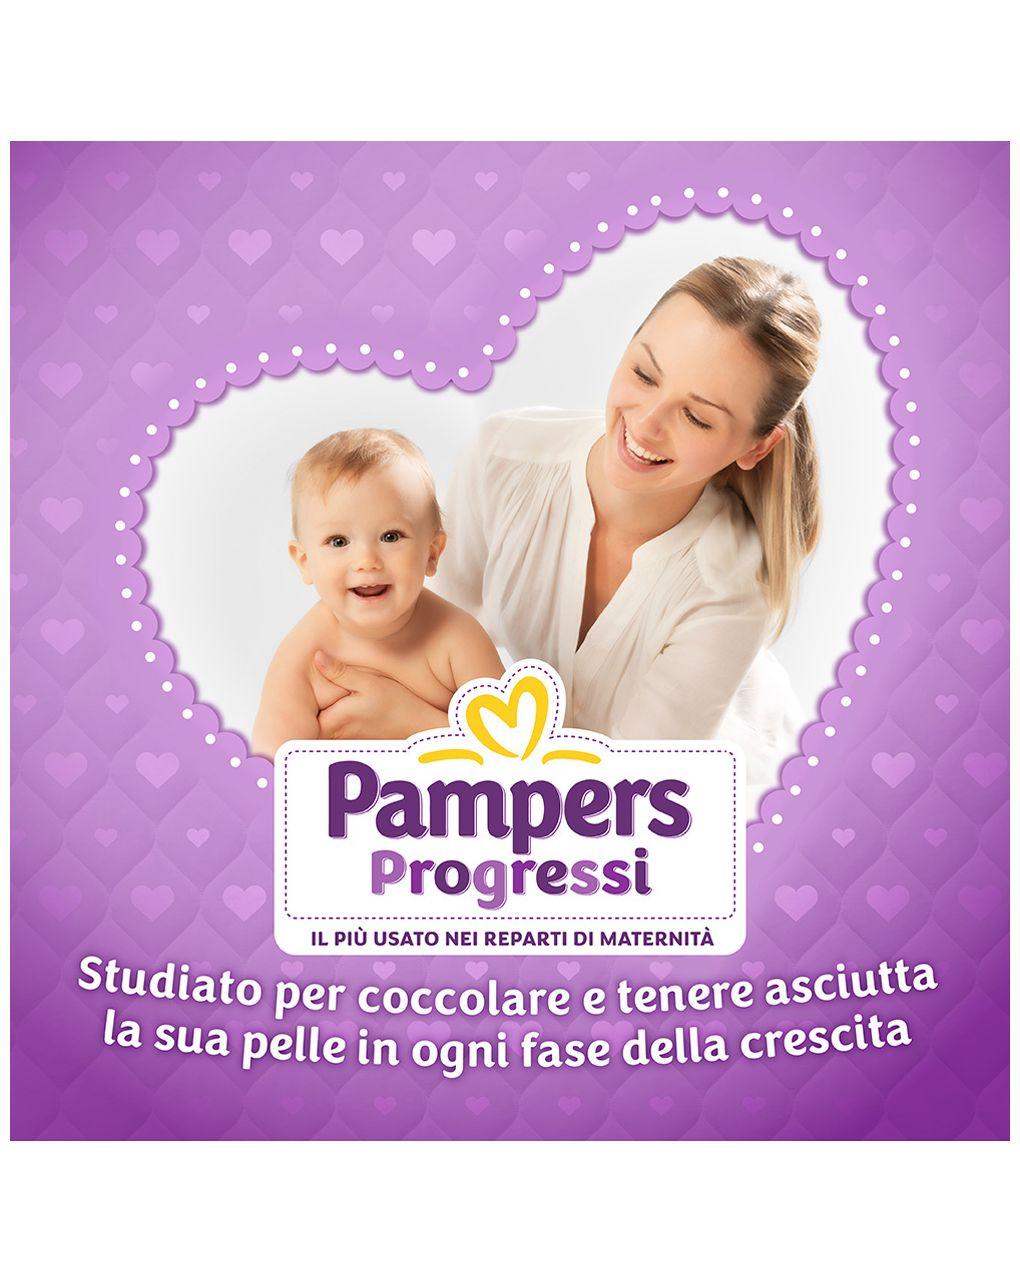 Pampers - pannolini progressi pentapack tg. 5 (93 pz) - Pampers